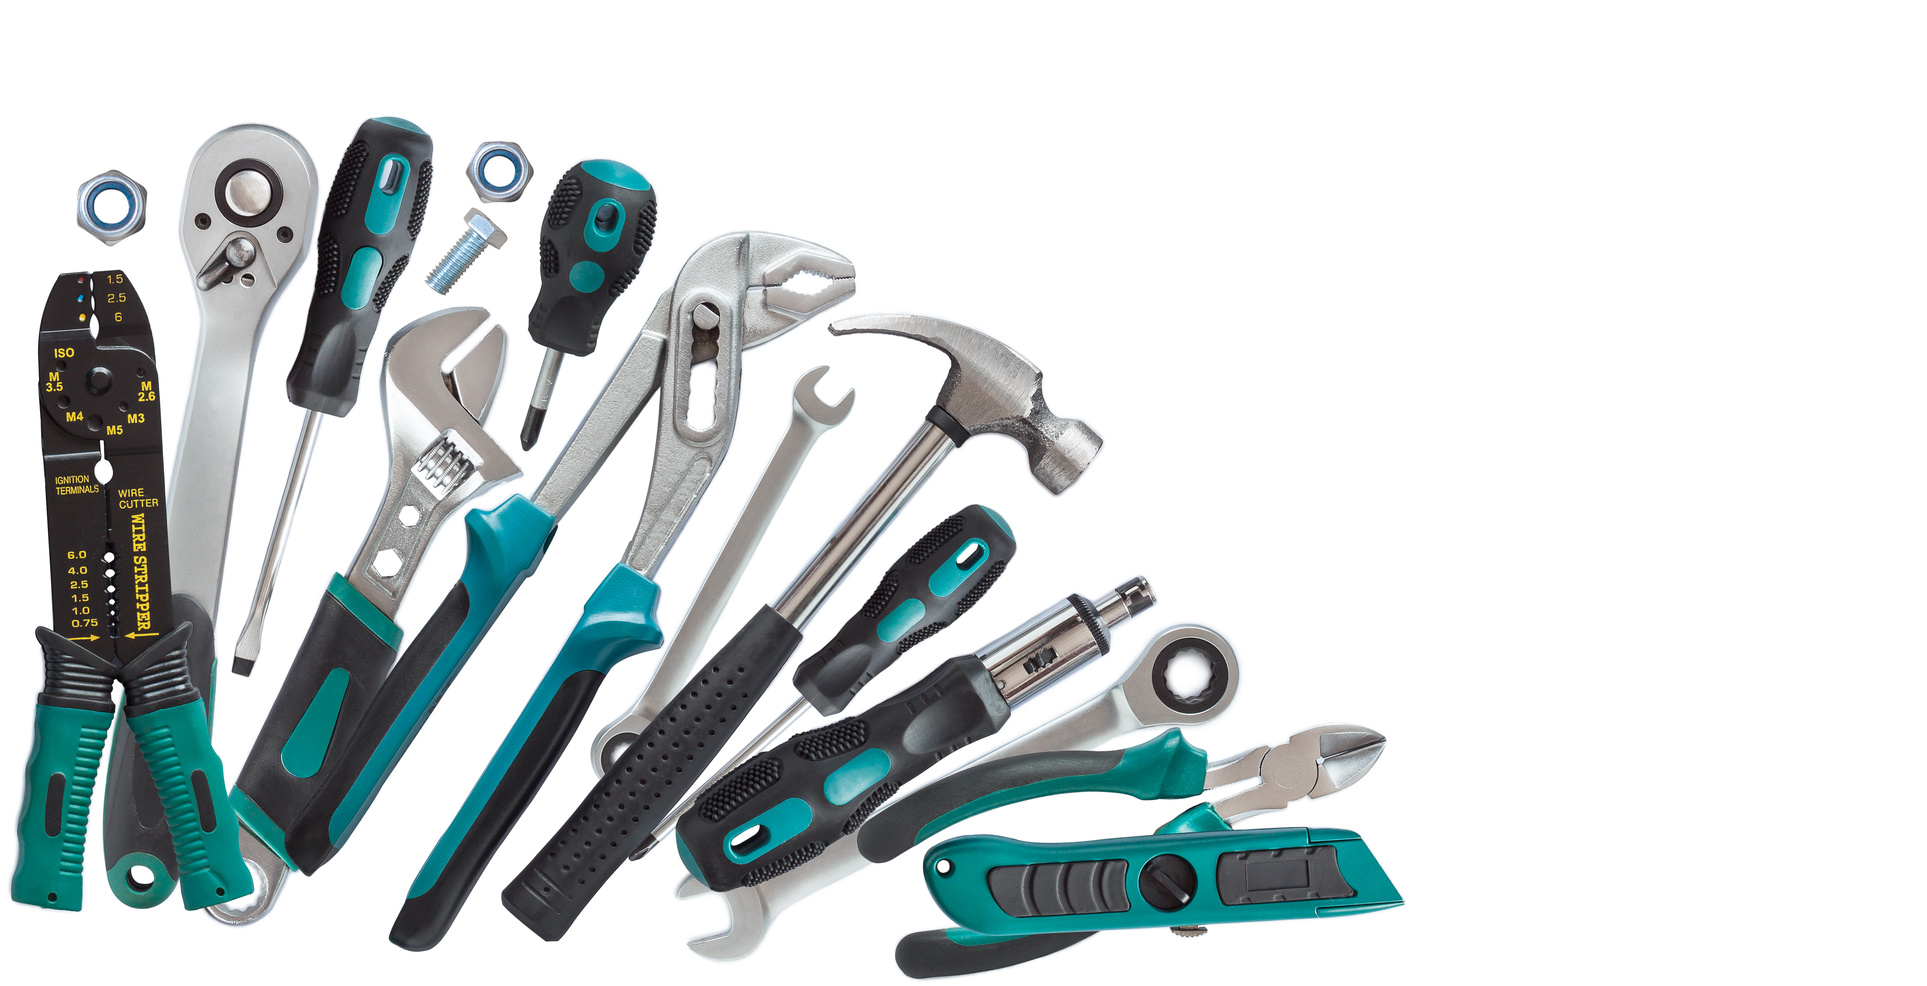 Super Maintenance Business – Urgent Sale Required